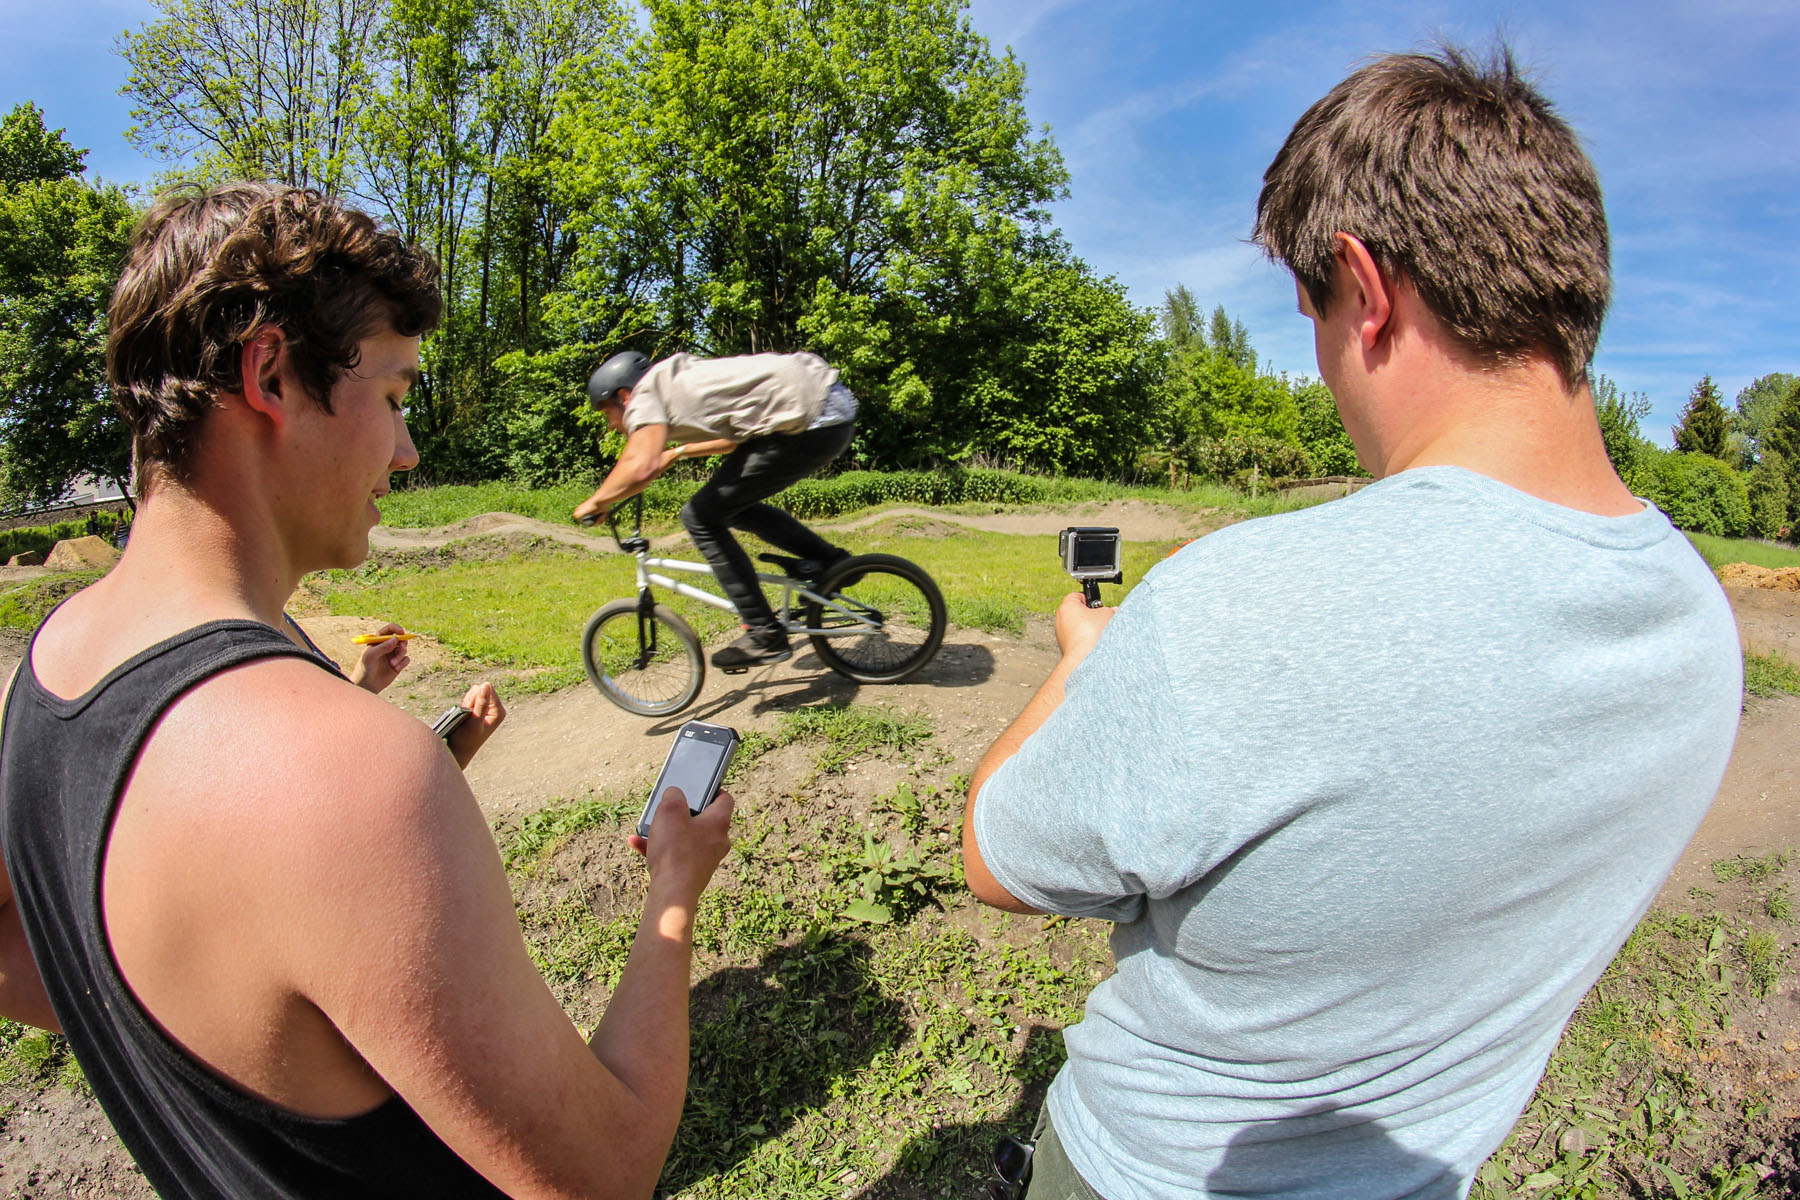 Pumptrackrace auf den Barons of Trails 2016 in Freising